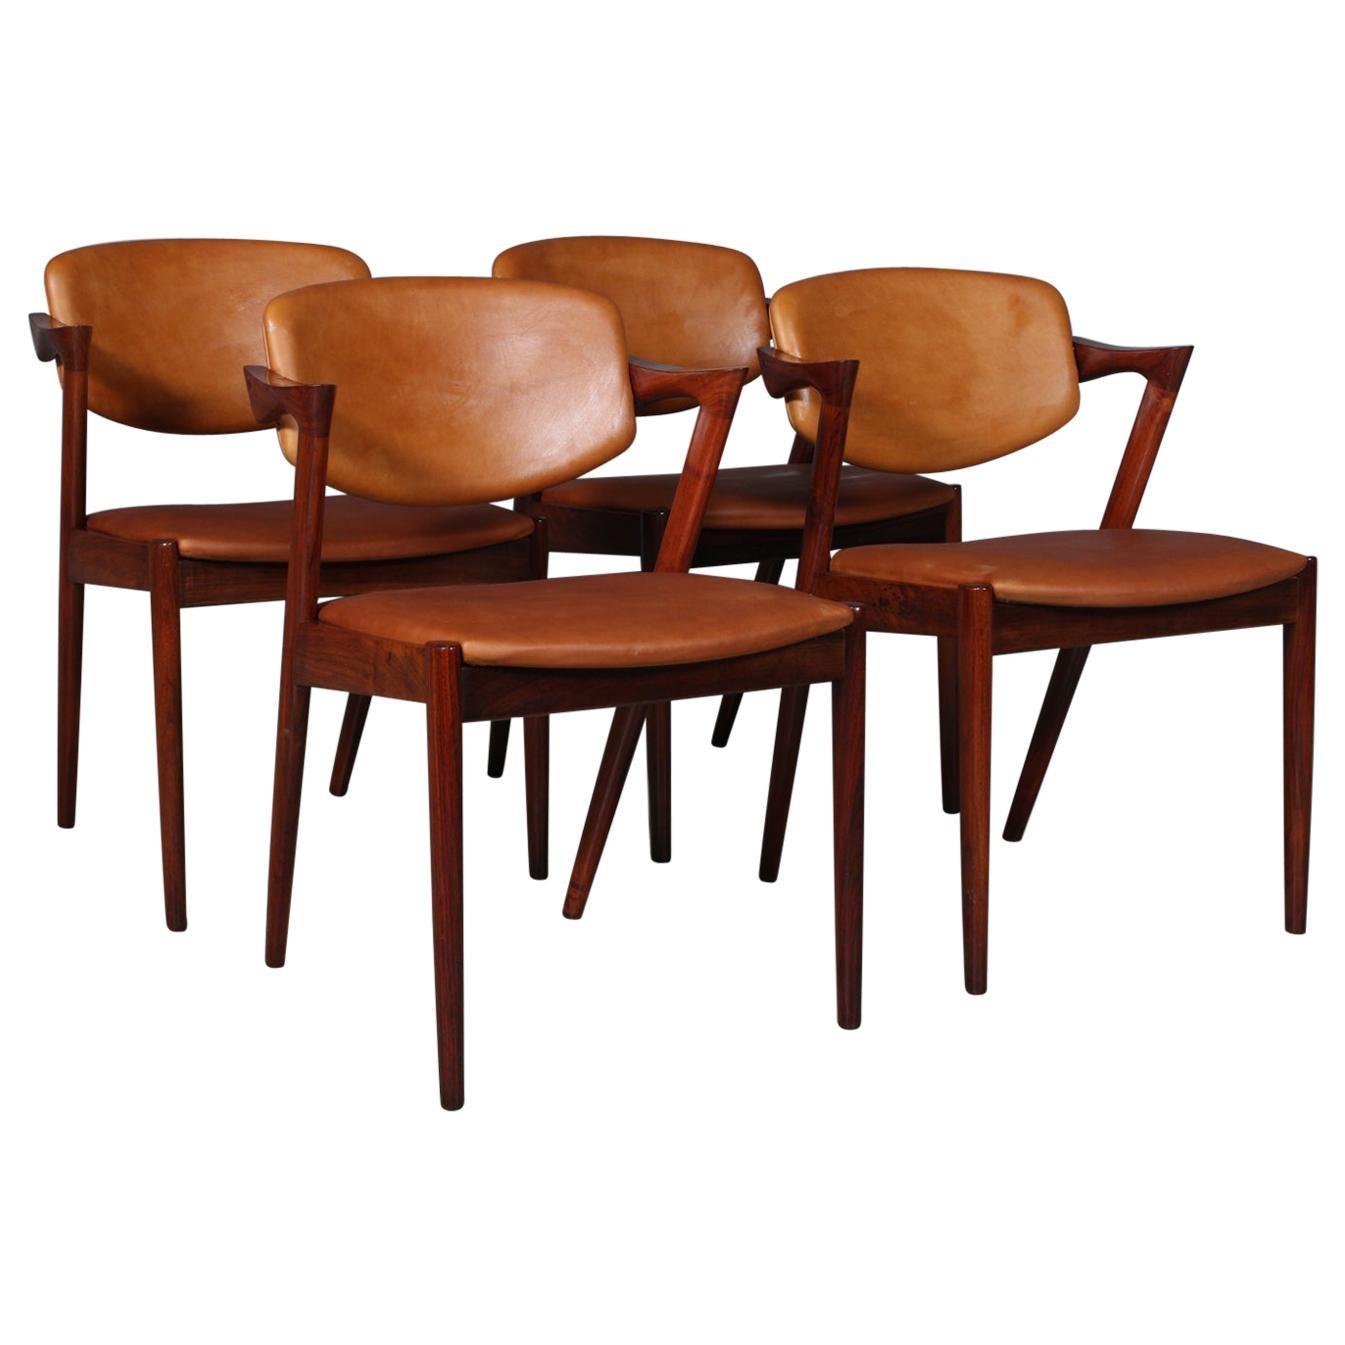 Set of 4 Kai Kristiansen Model 42 Dining Chairs, Rosewood